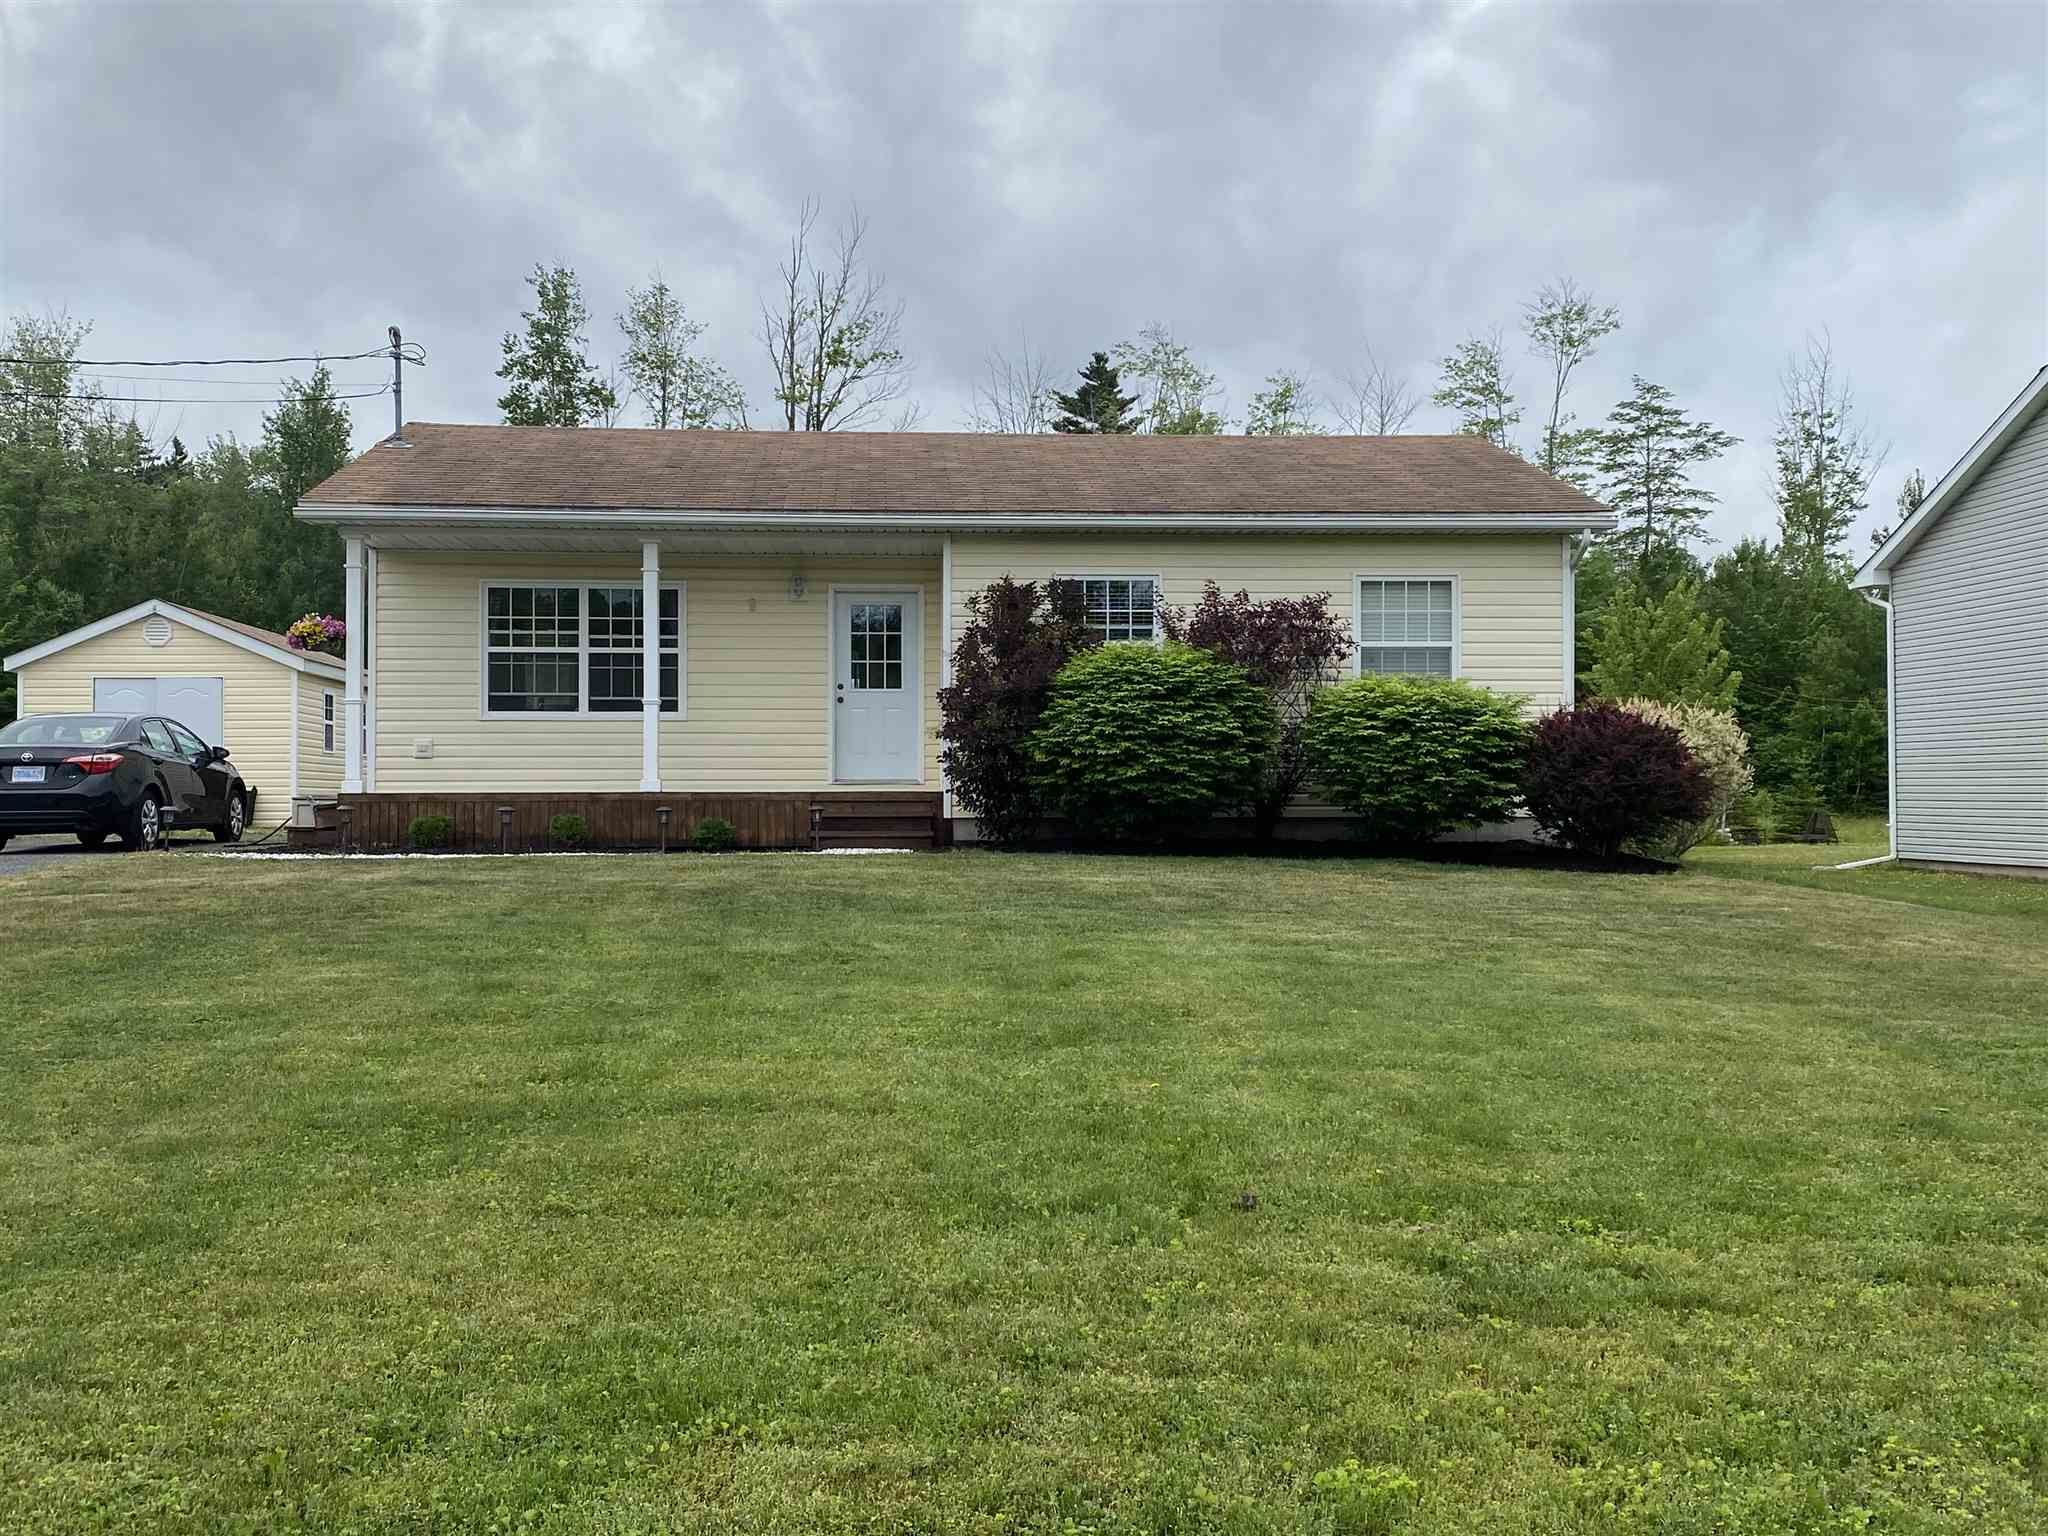 Main Photo: 2381 Truro Road in Westville: 107-Trenton,Westville,Pictou Residential for sale (Northern Region)  : MLS®# 202105671